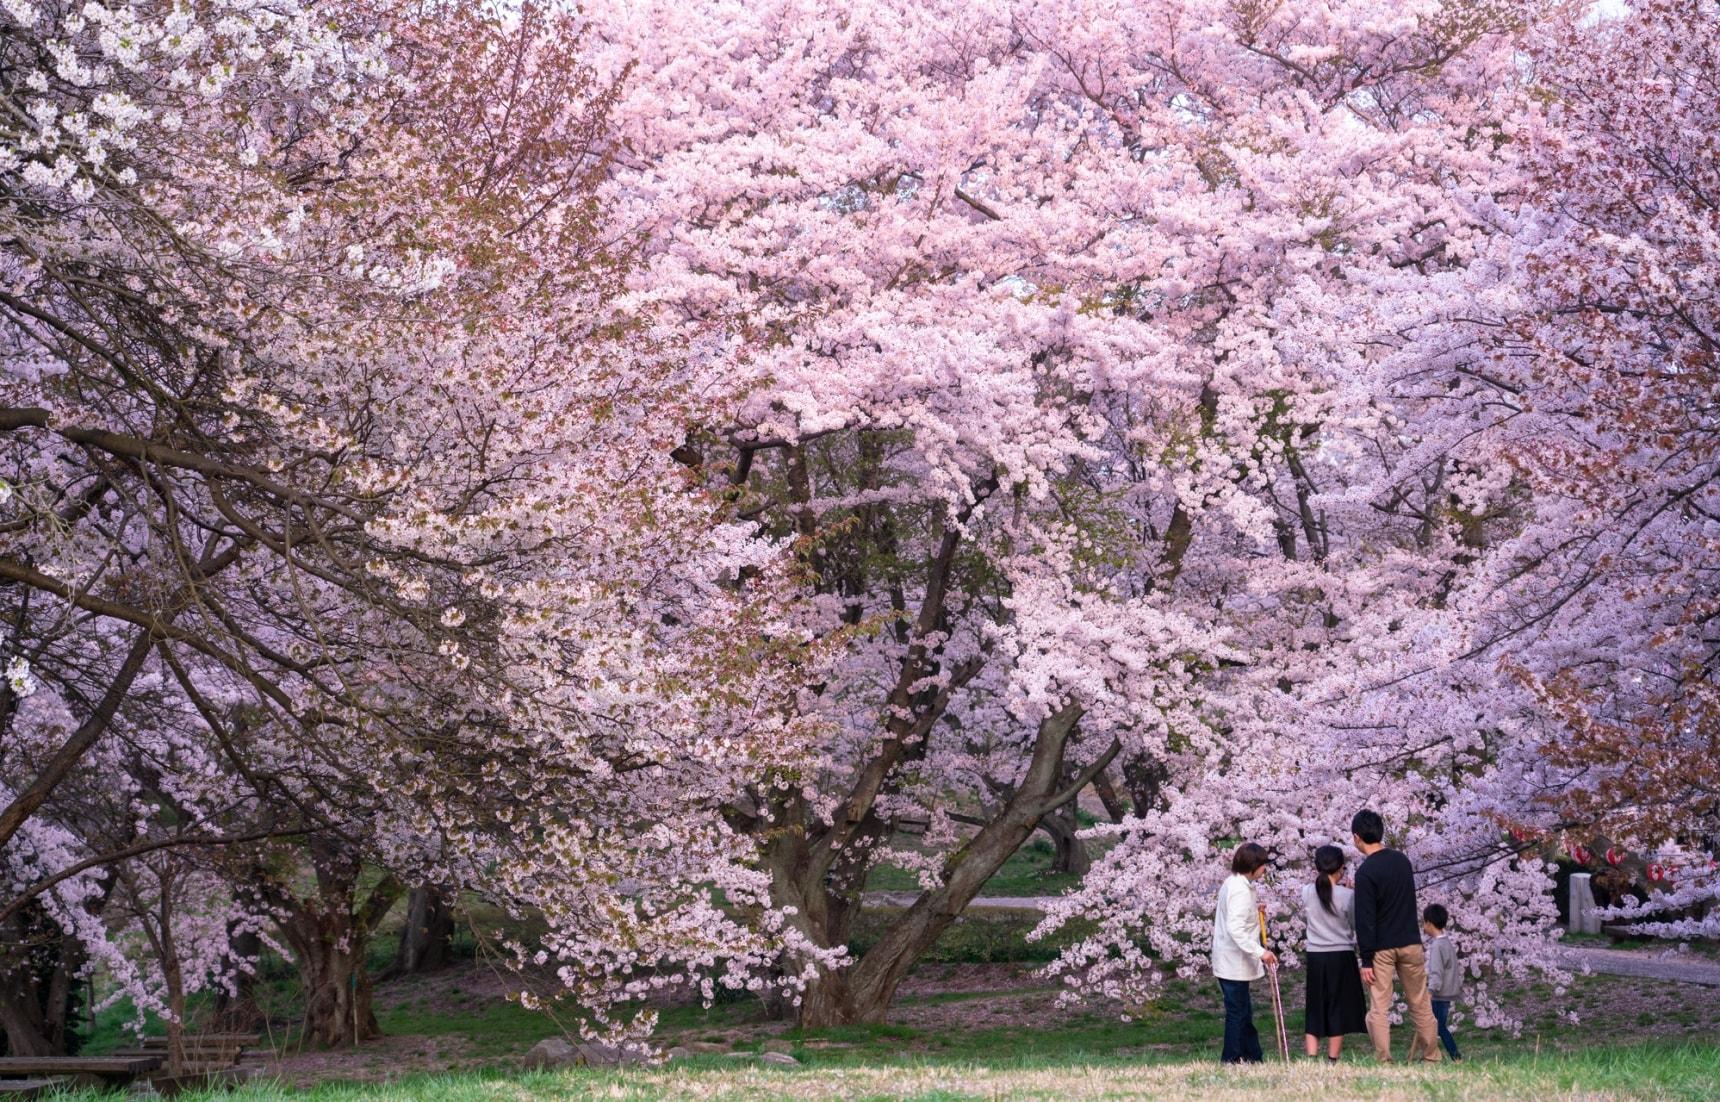 Incredible Cherry Blossoms in Kagawa